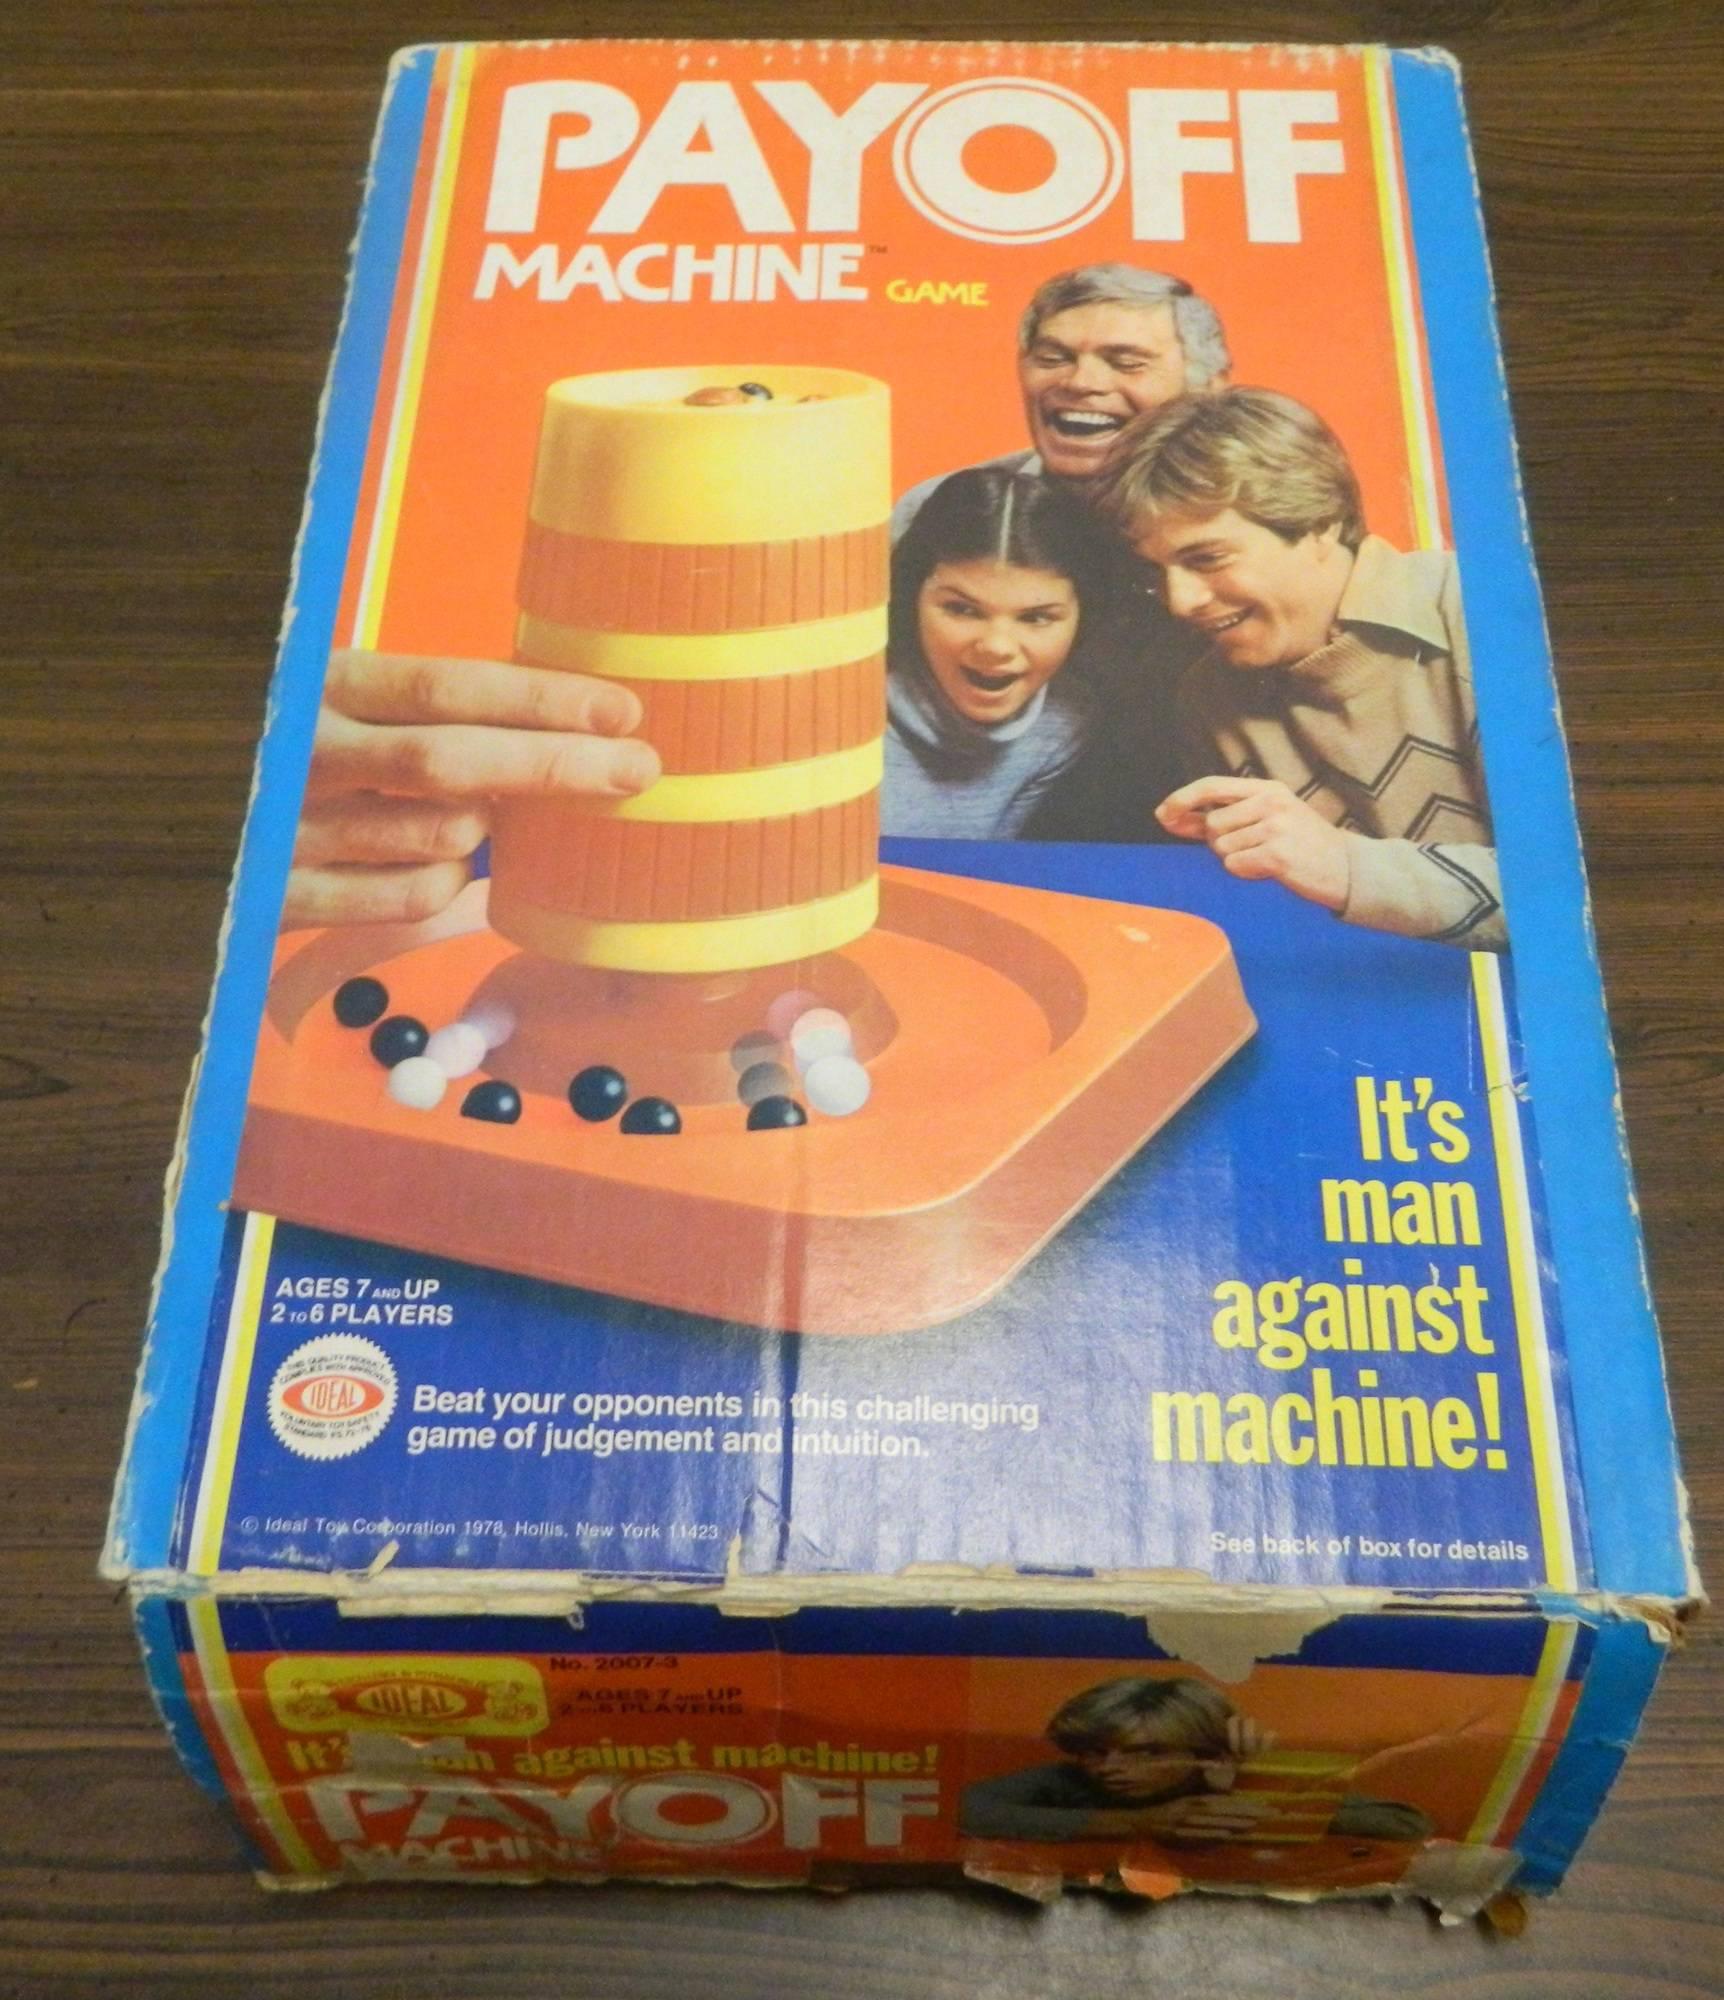 Box for Payoff Machine